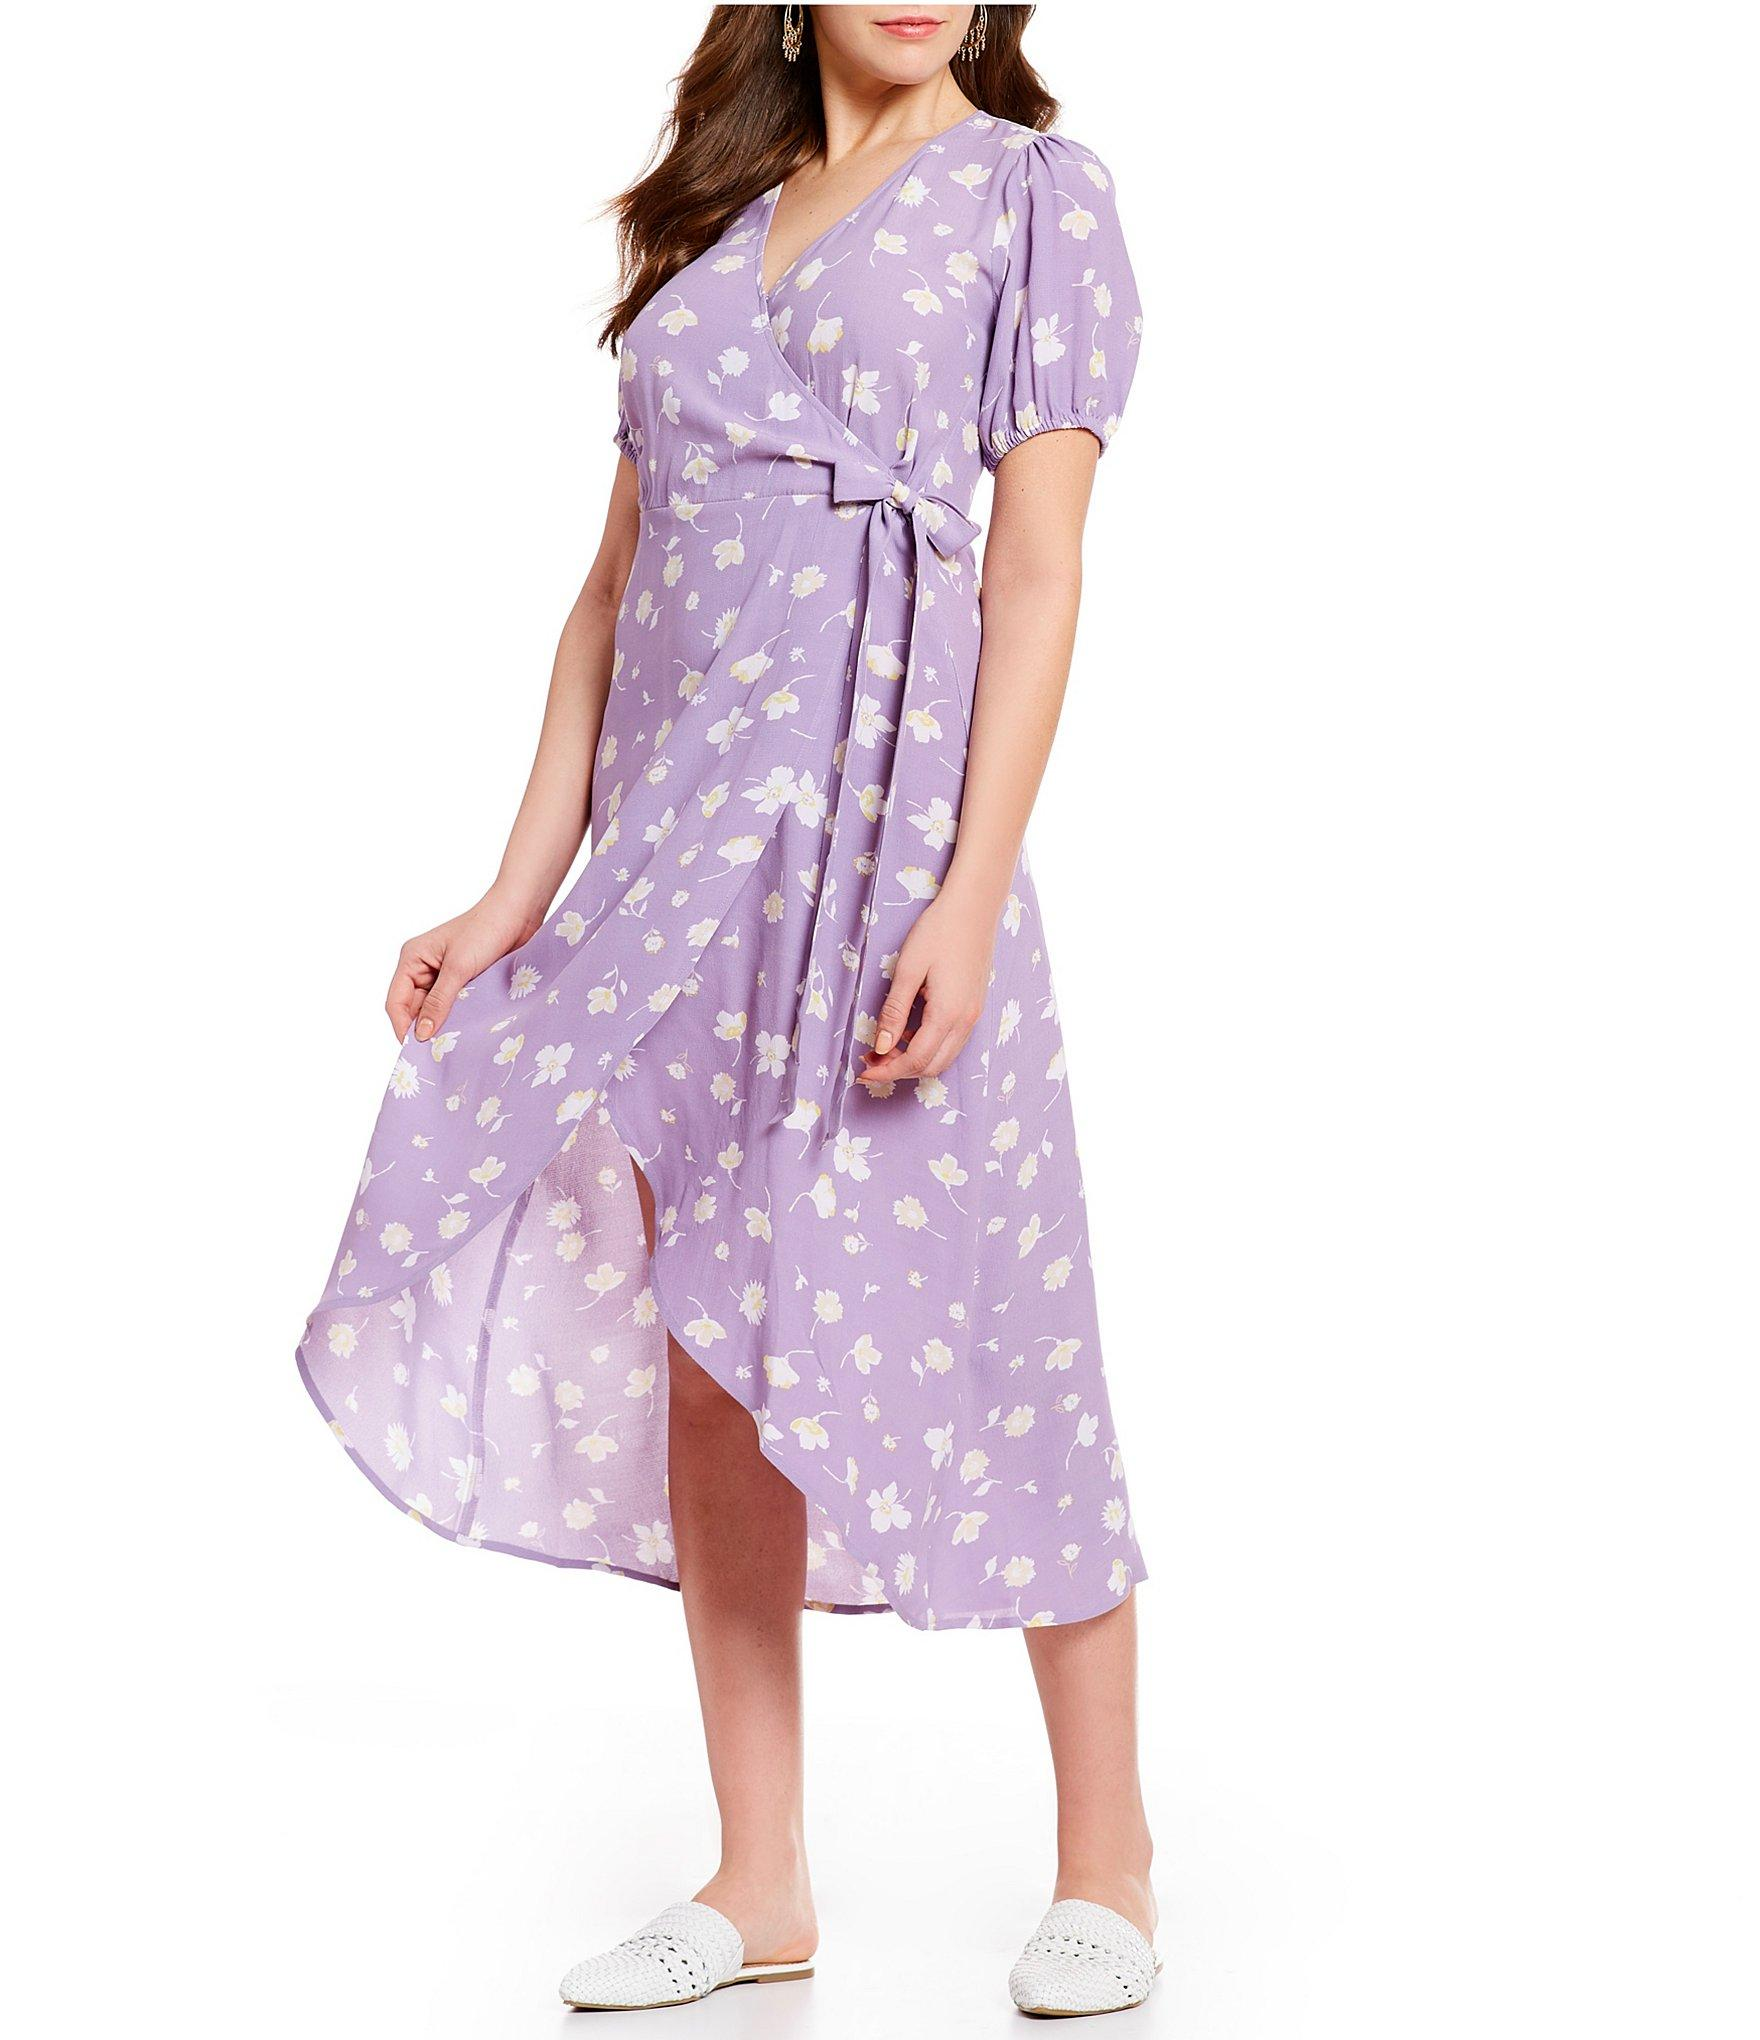 46b1ed0873 Sanctuary - Purple Meadow Floral Print Midi Length Wrap Dress - Lyst. View  fullscreen